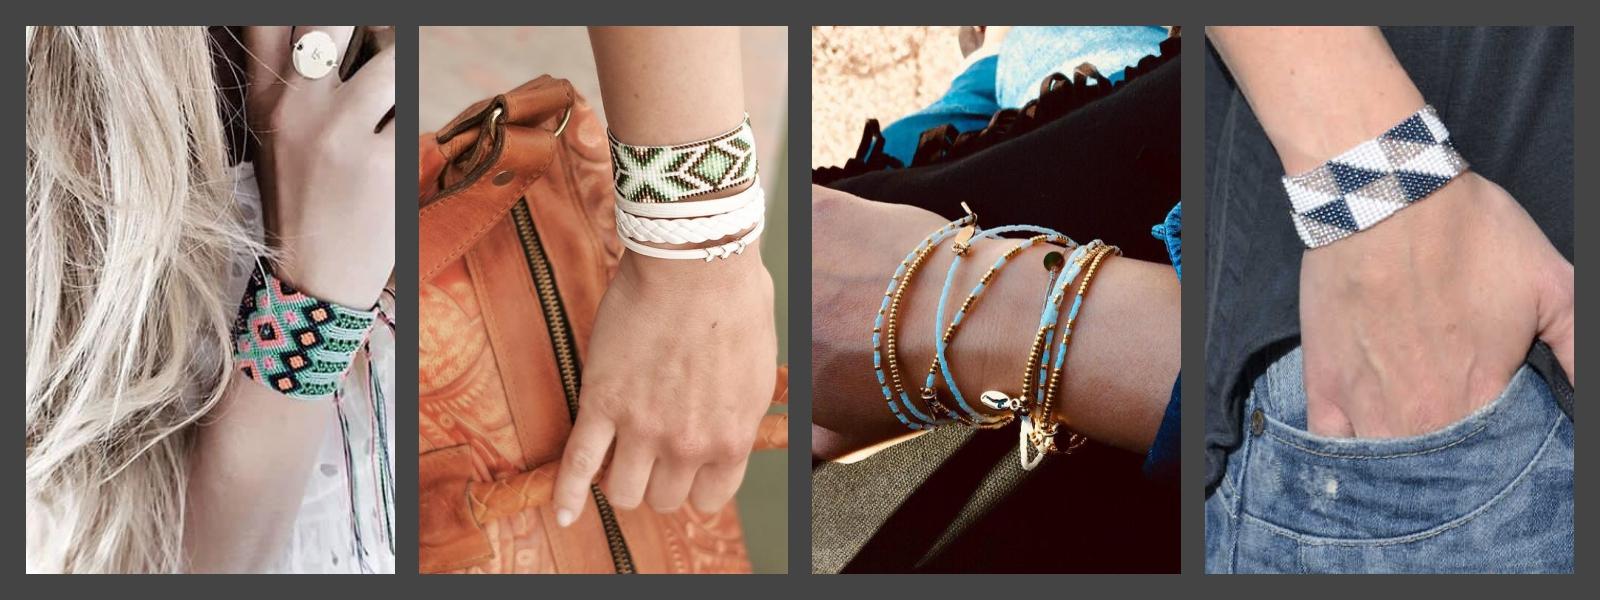 montagne-ski-skieuse-creatrice-savoie-valmorel-station-femme-maman-bracelets